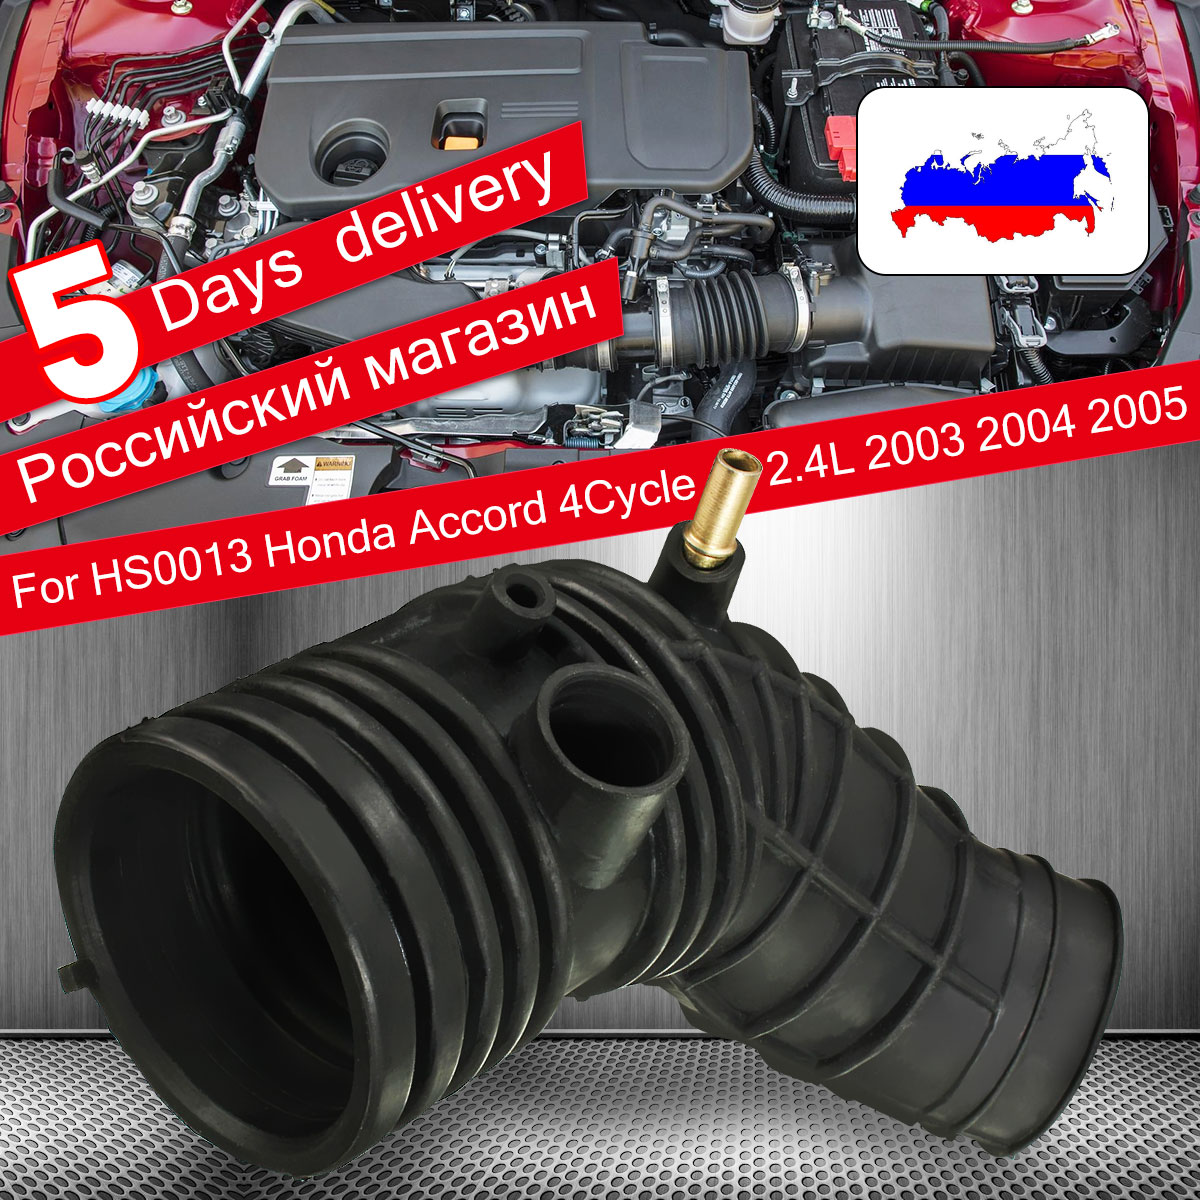 Air Intake Hose For 2003 2004 2005 2006 2007 Honda Accord Intake Boot Air Intake Duct Replaces OE# 17228-RAA-A00 17228RAAA00 696-739